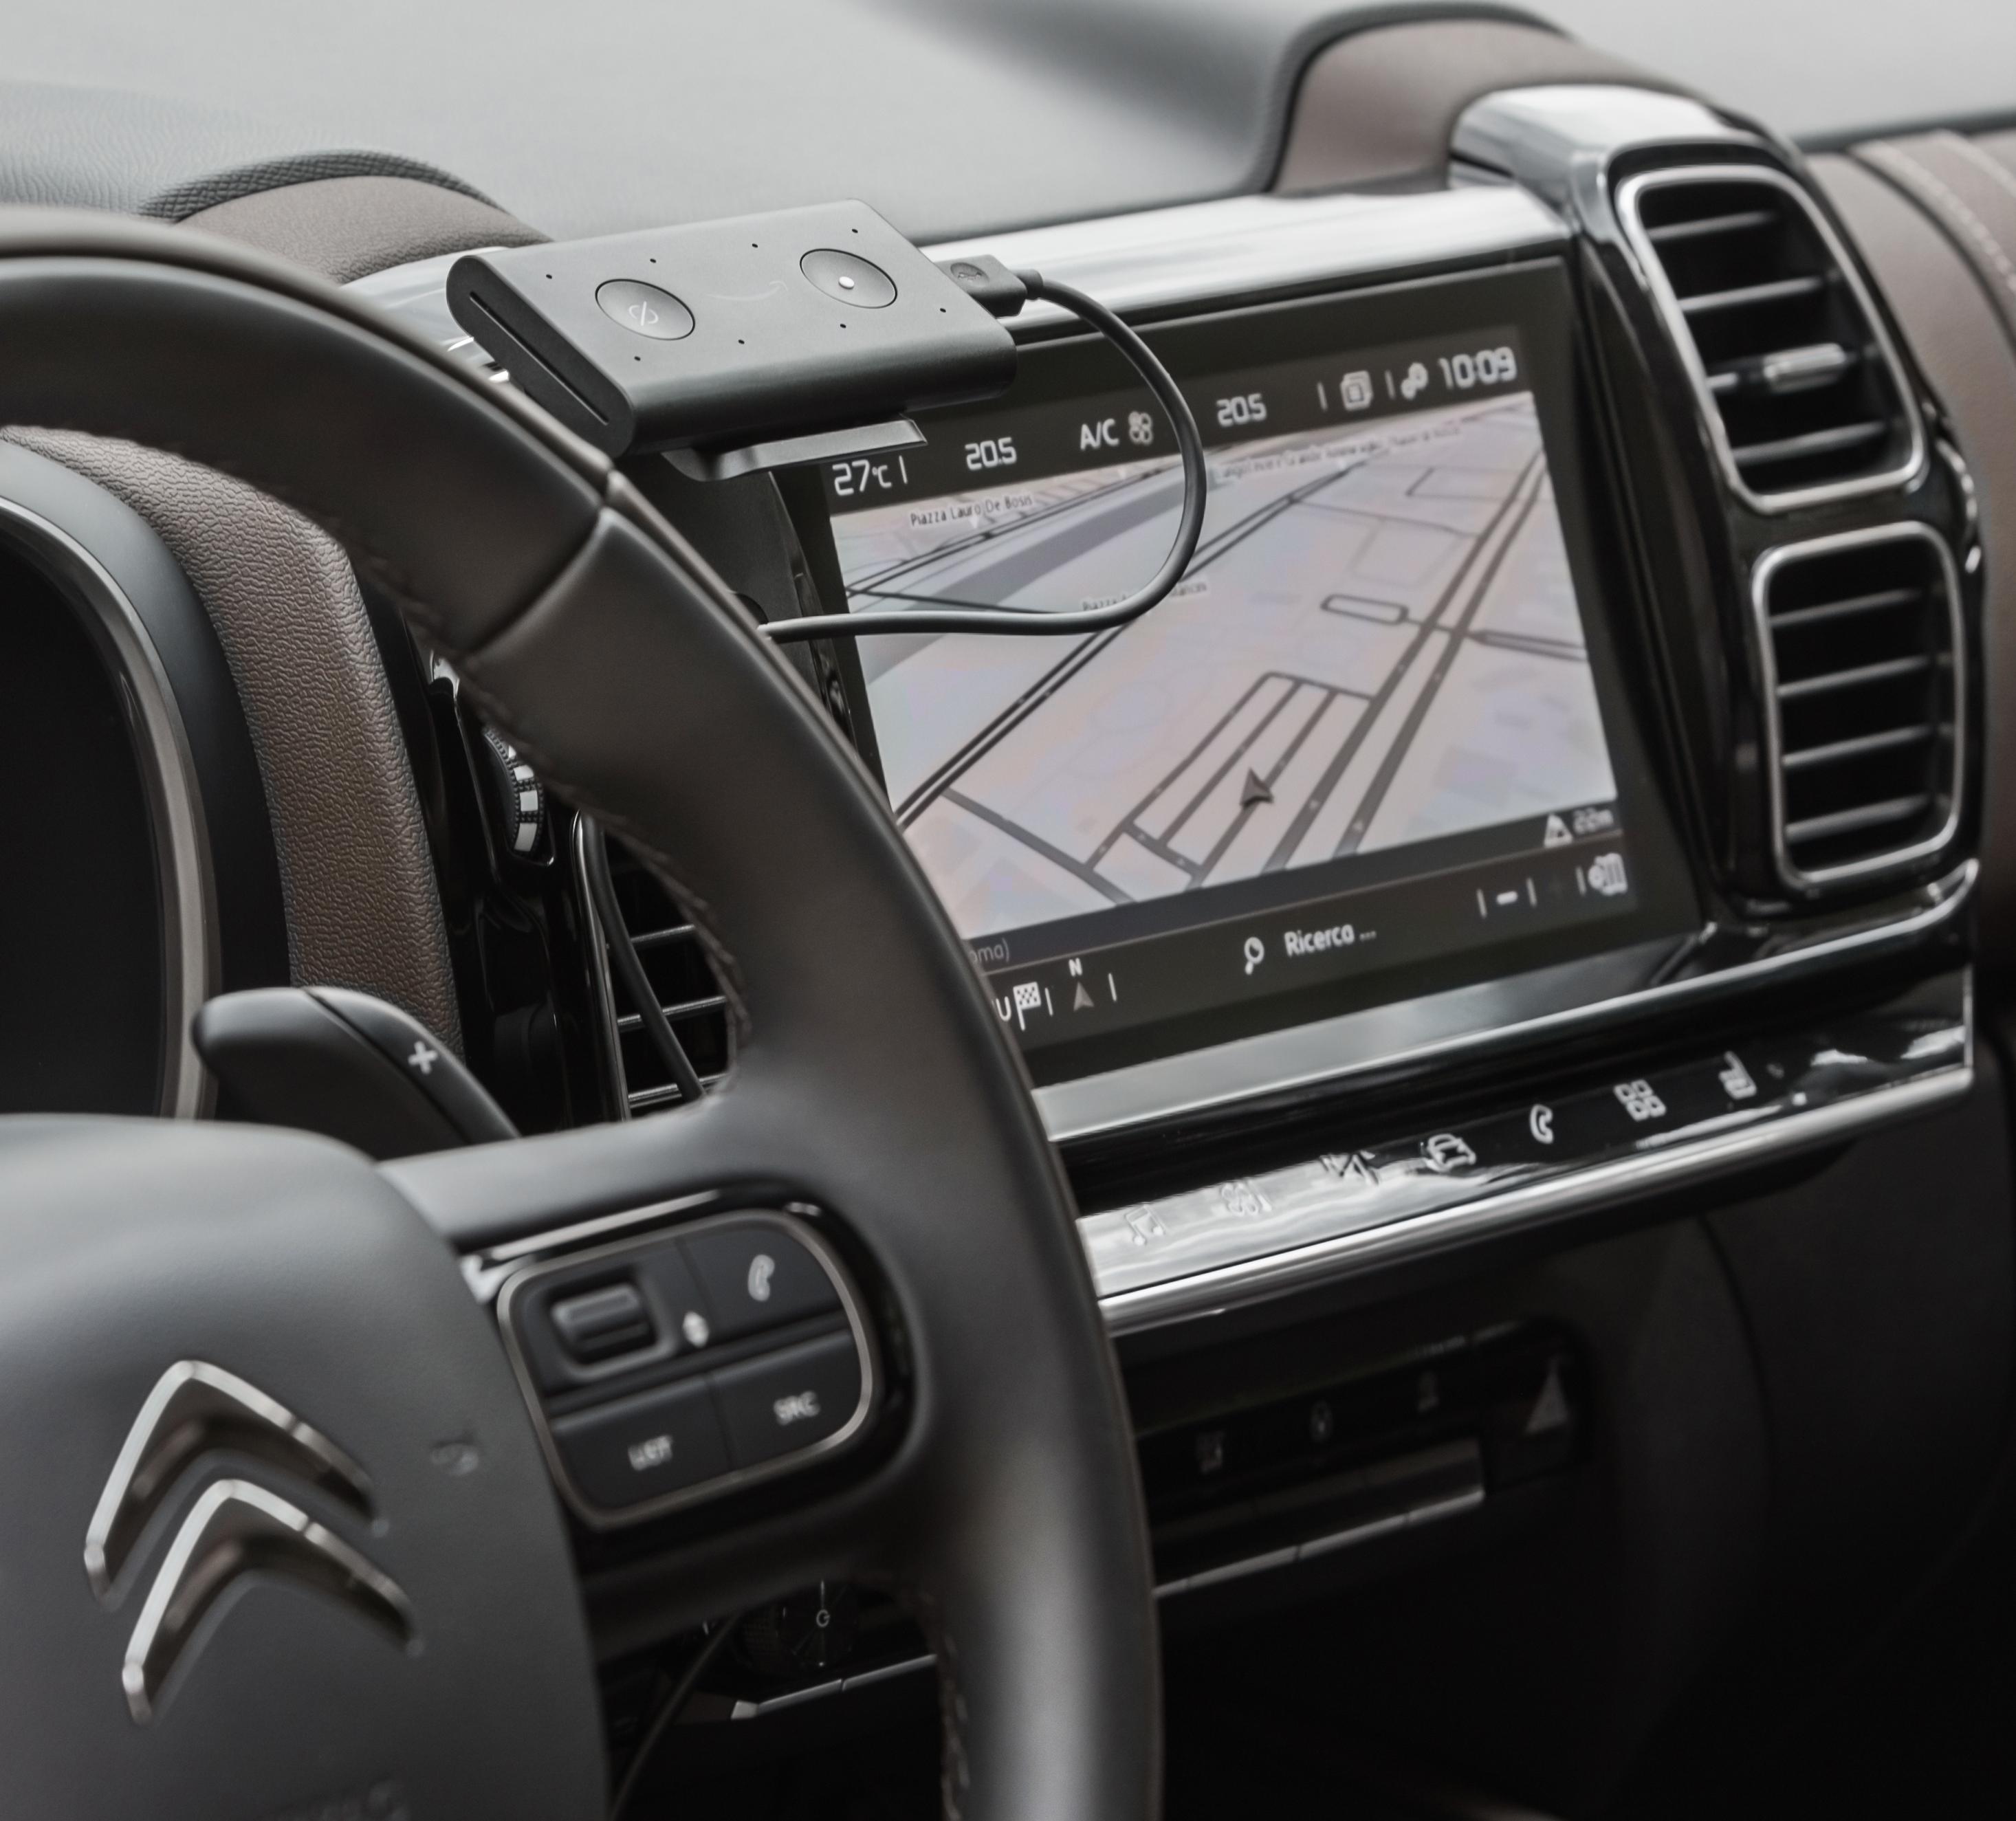 Echo Auto: Amazon bringt Alexa für 60 Euro ins Auto - Echo Auto (Bild: Amazon)